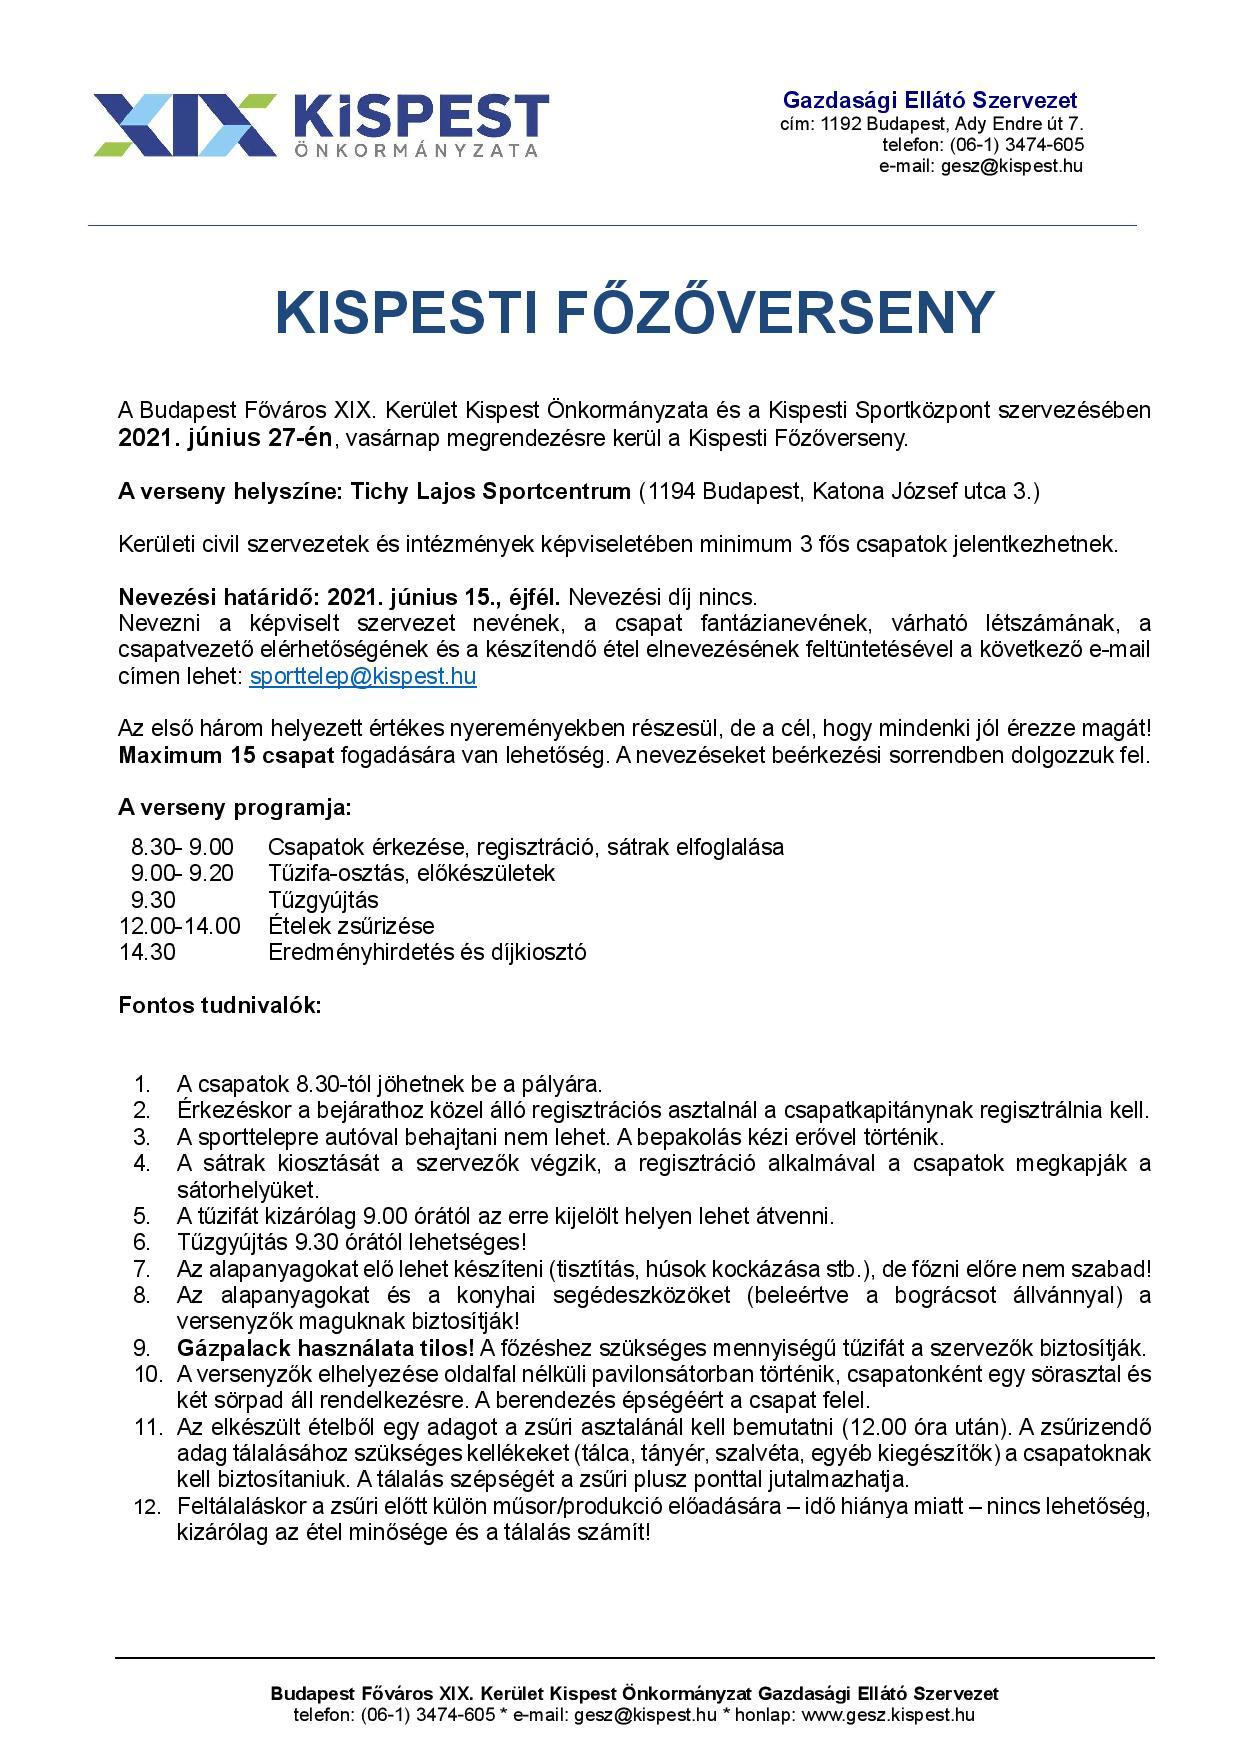 kispesti-fozoverseny2021